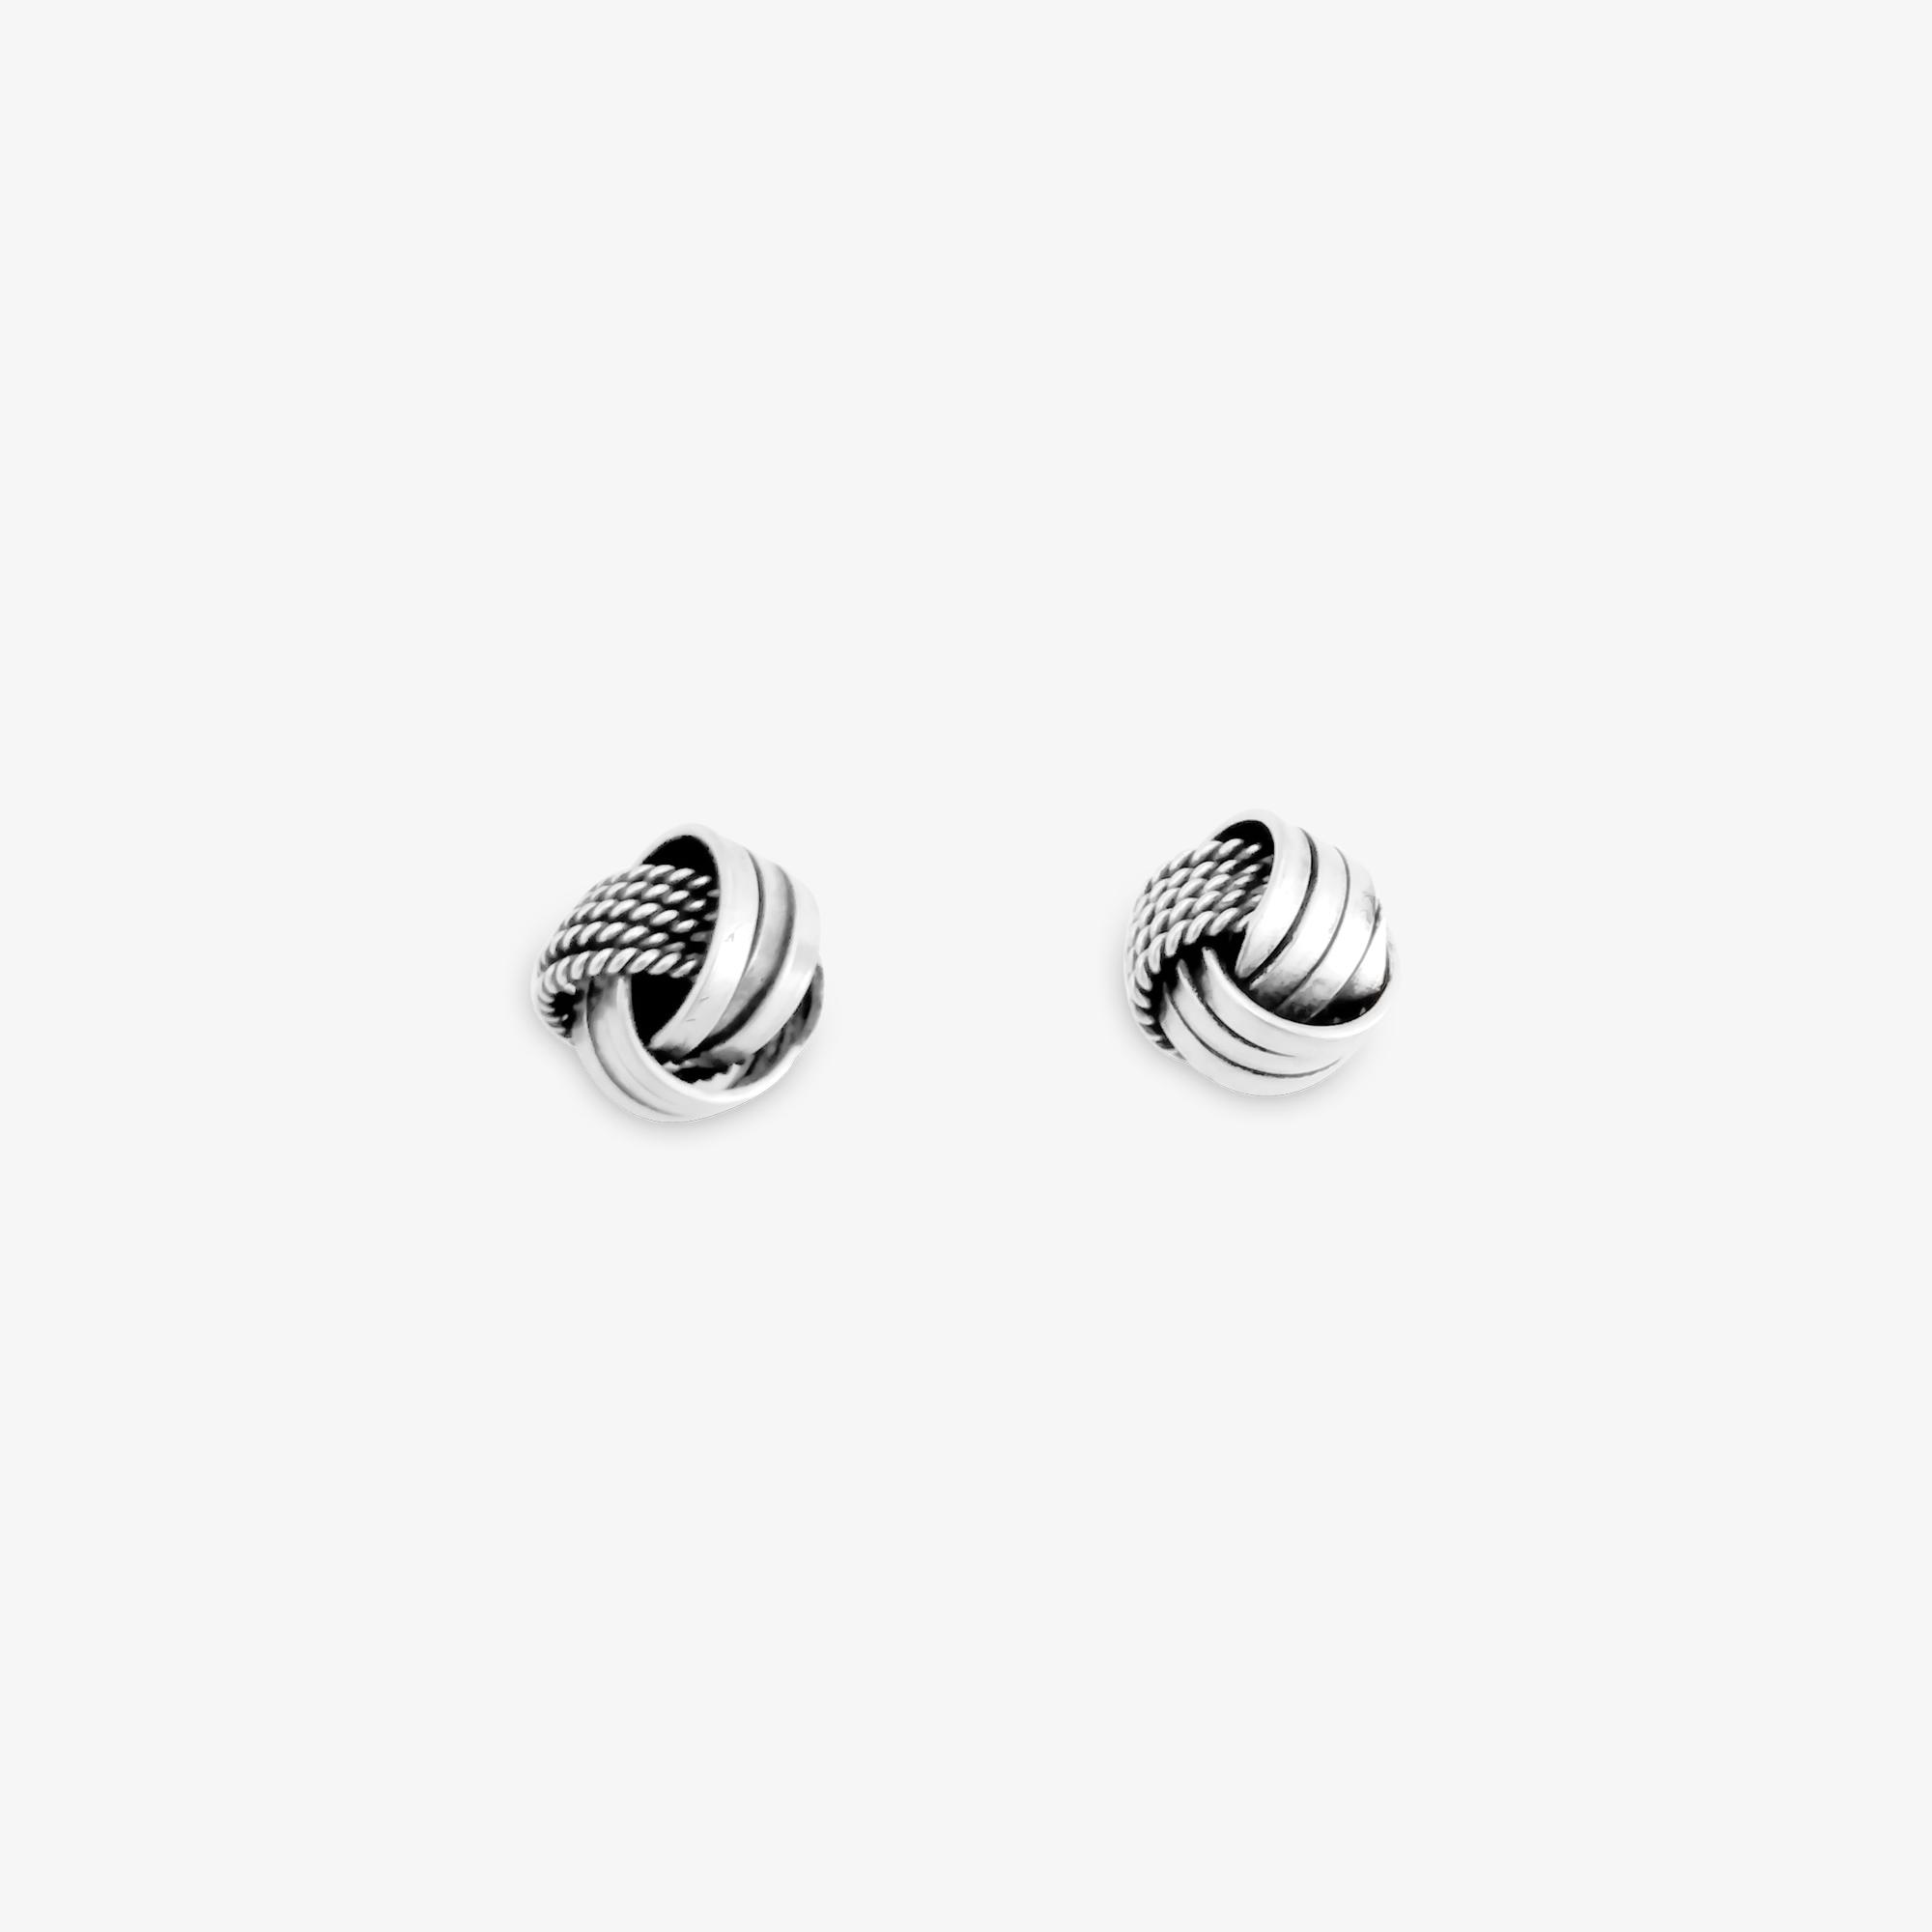 Tiny Stud Earrings